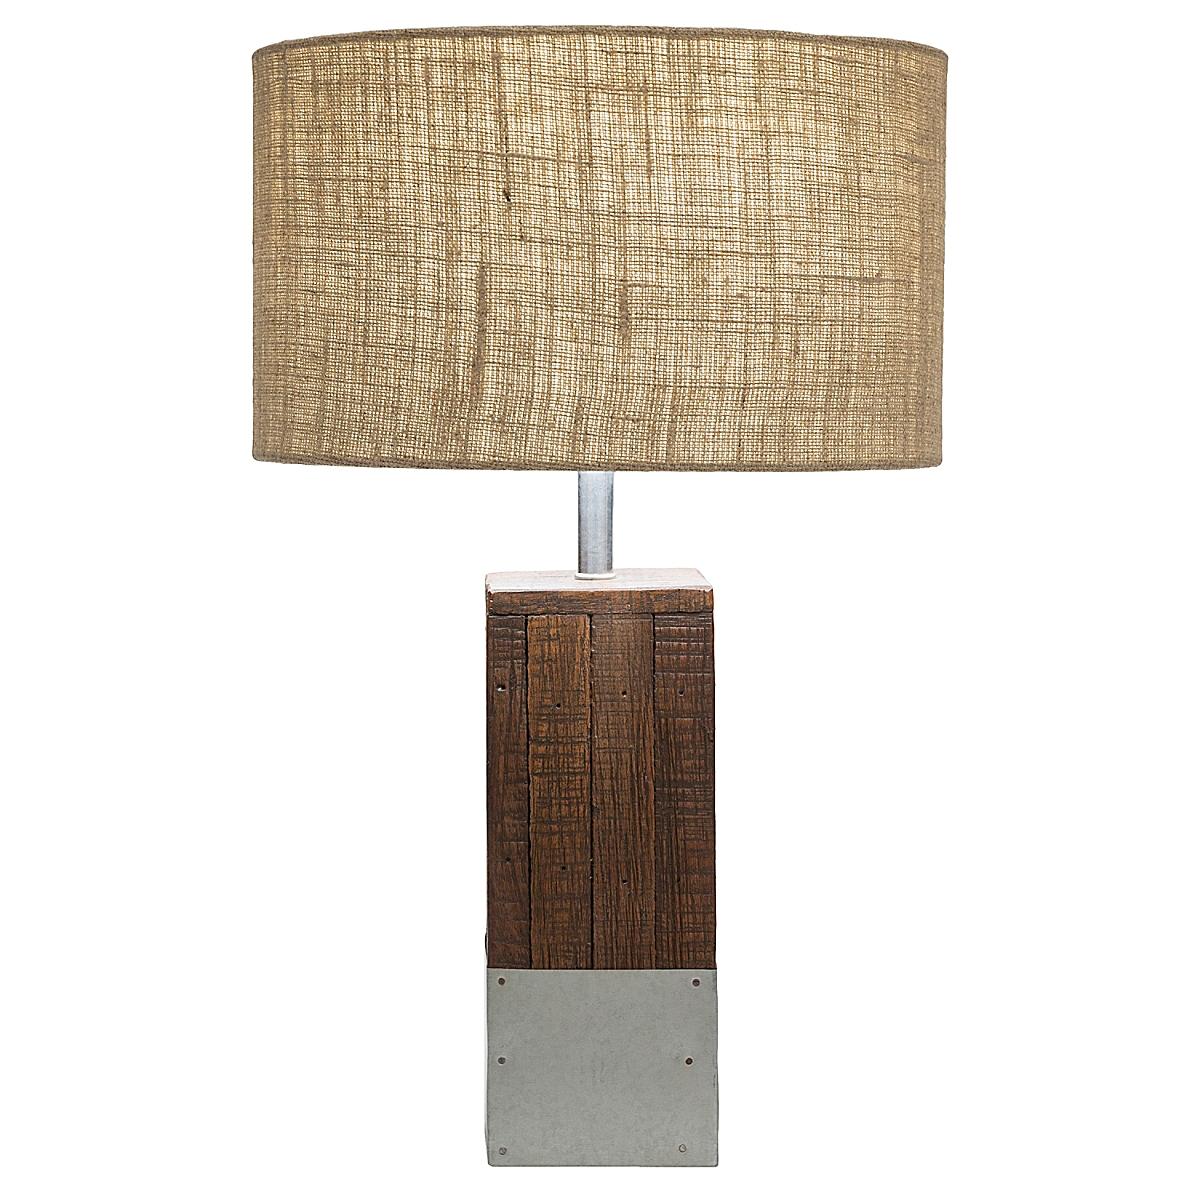 Ren Table Lamp - Natural